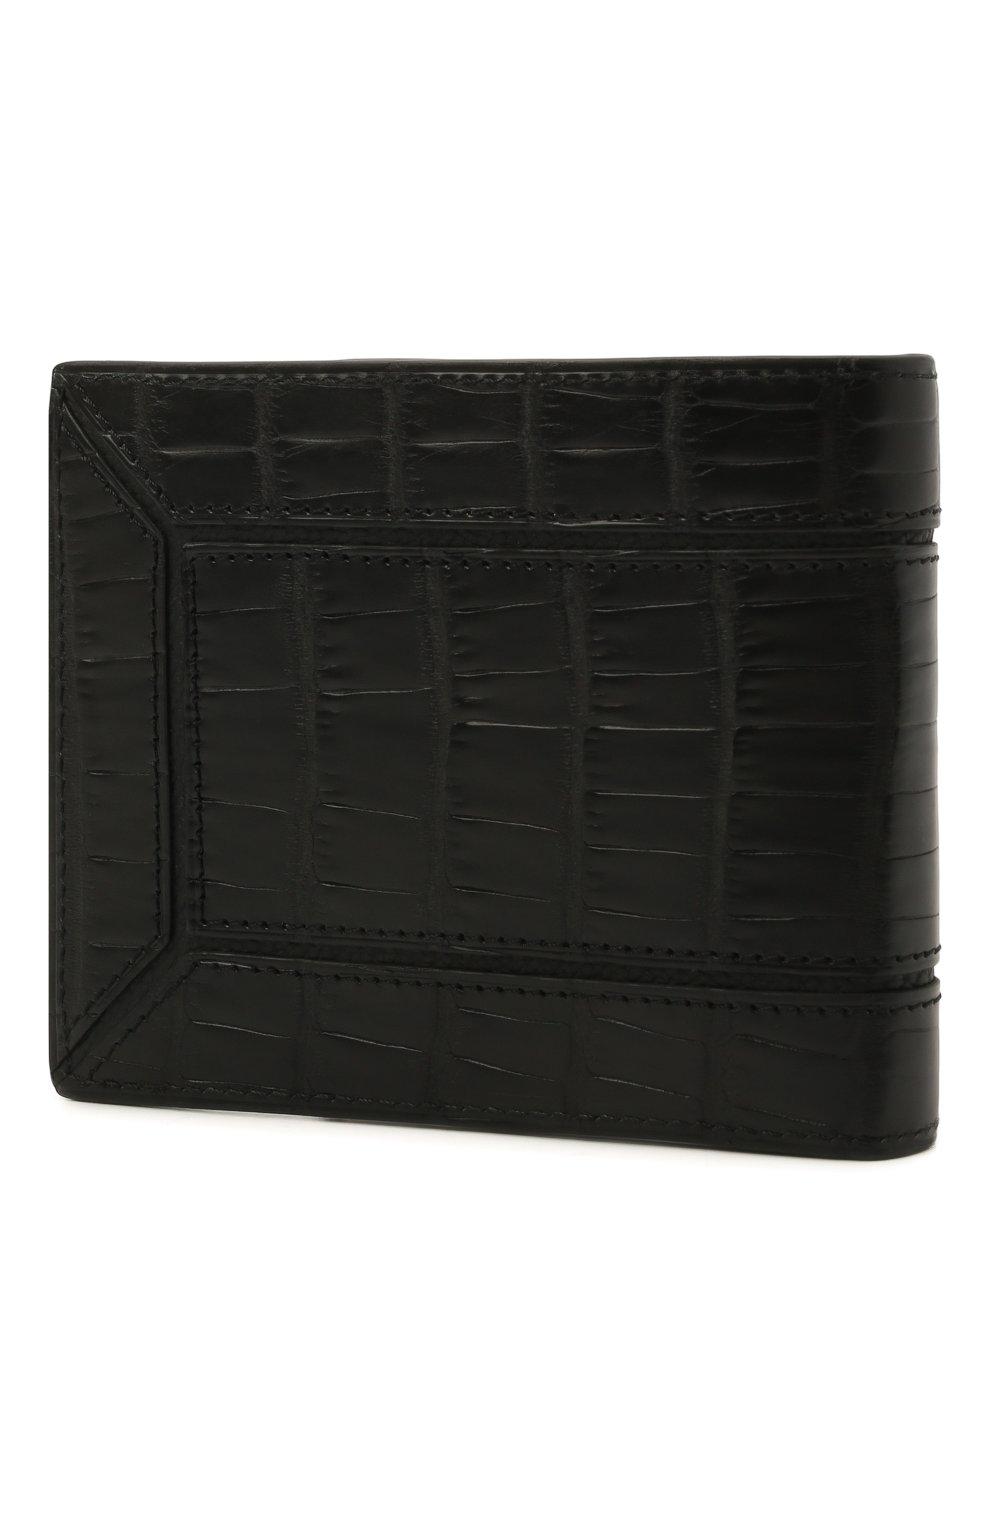 Мужской портмоне из кожи аллигатора ZILLI черного цвета, арт. MJL-0WB02-A0106/0002/AMIS   Фото 2 (Материал: Экзотическая кожа)